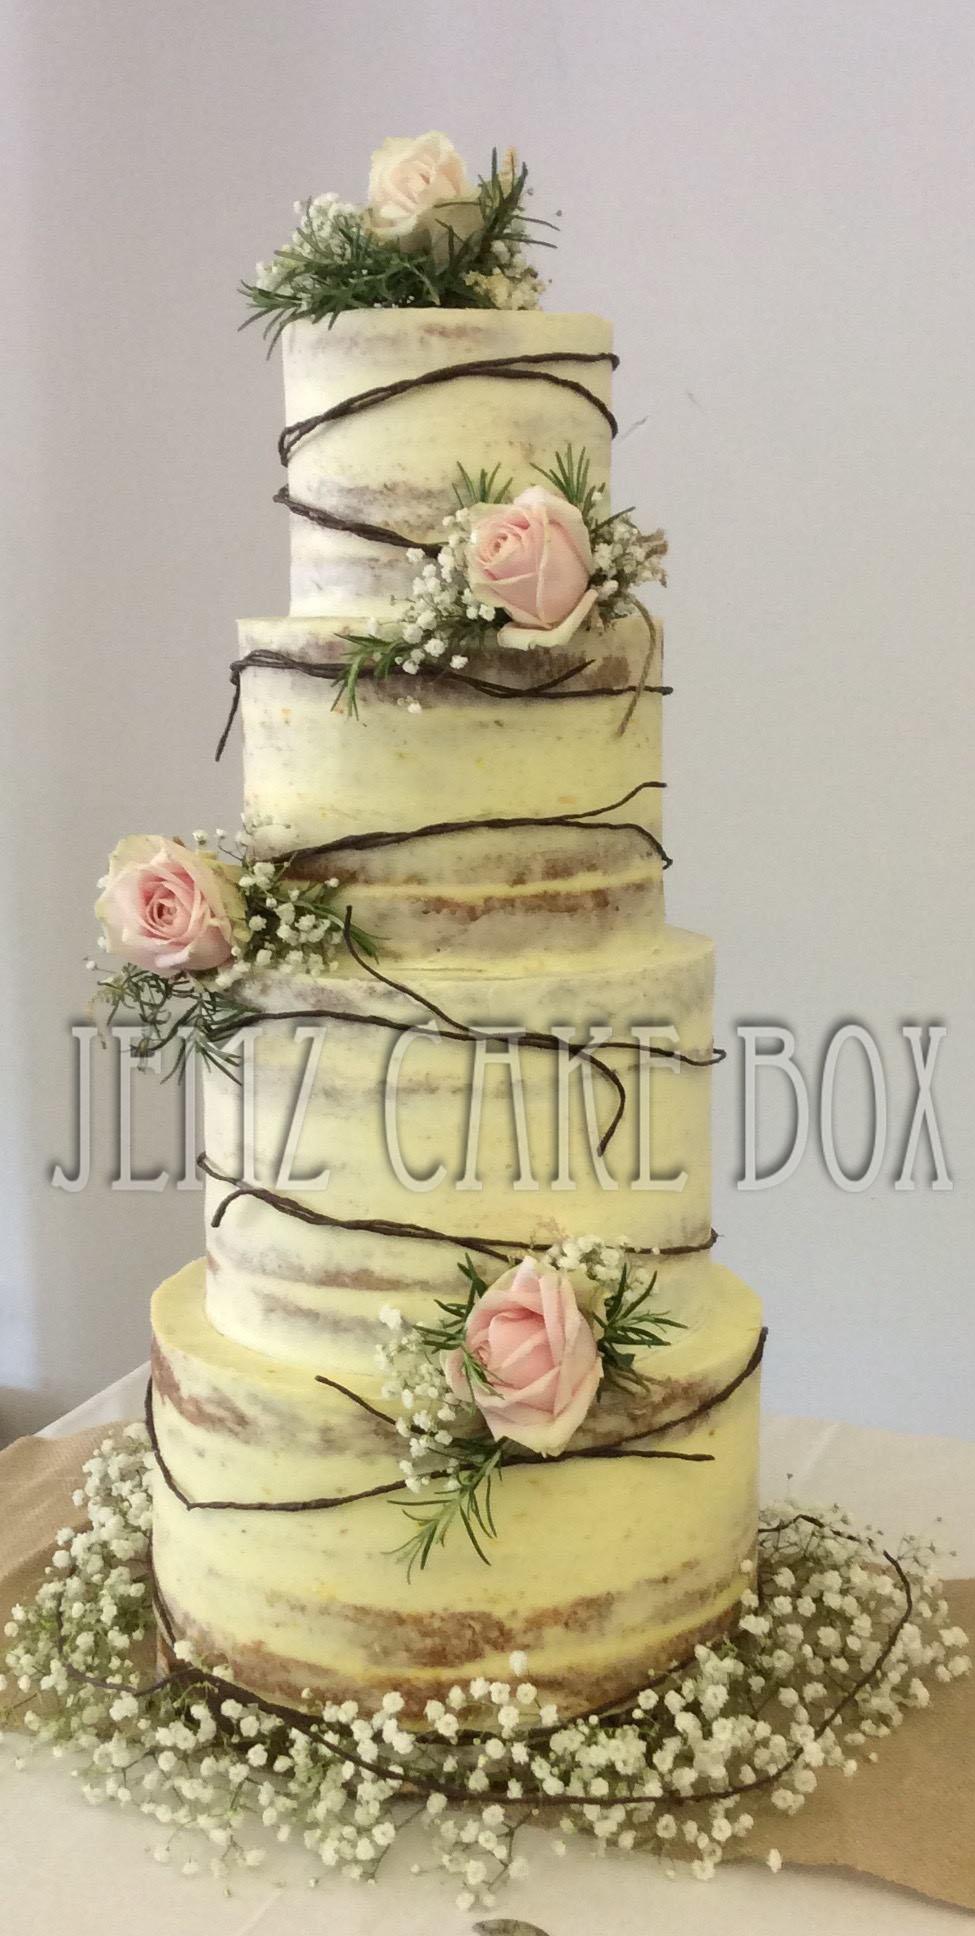 Wedding Cakes | Jemz Cake Box